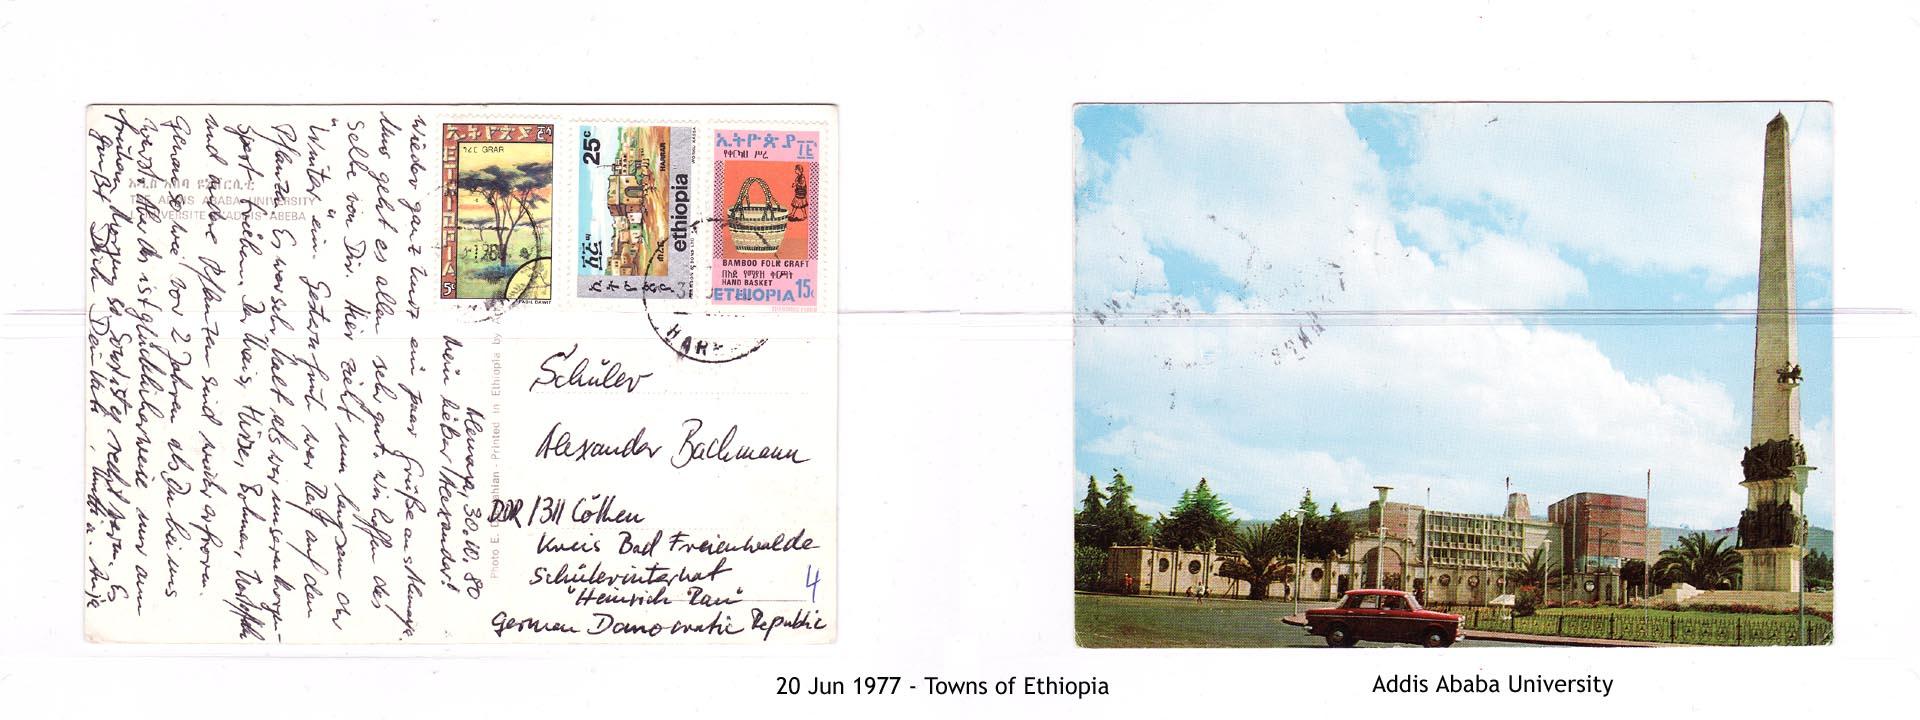 19770620 - Towns of Ethiopia